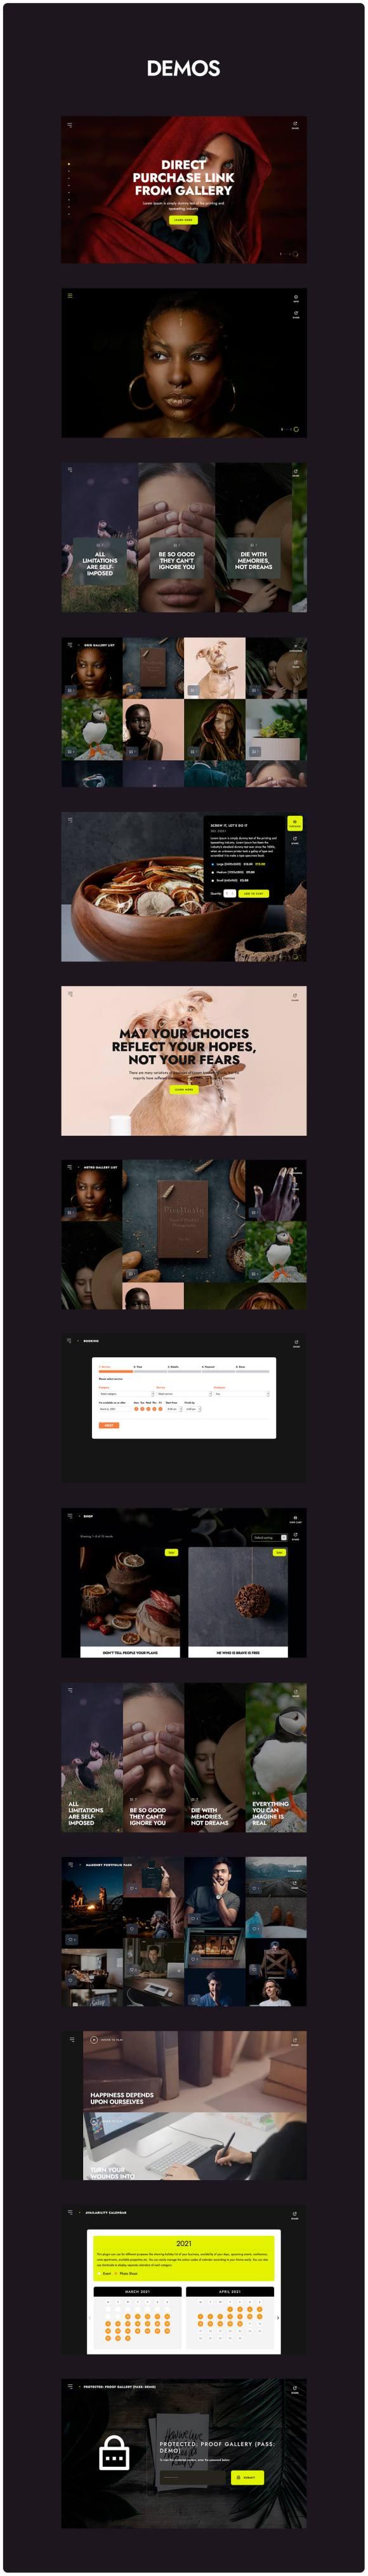 Marshmallow - Photographer WordPress Theme - 2